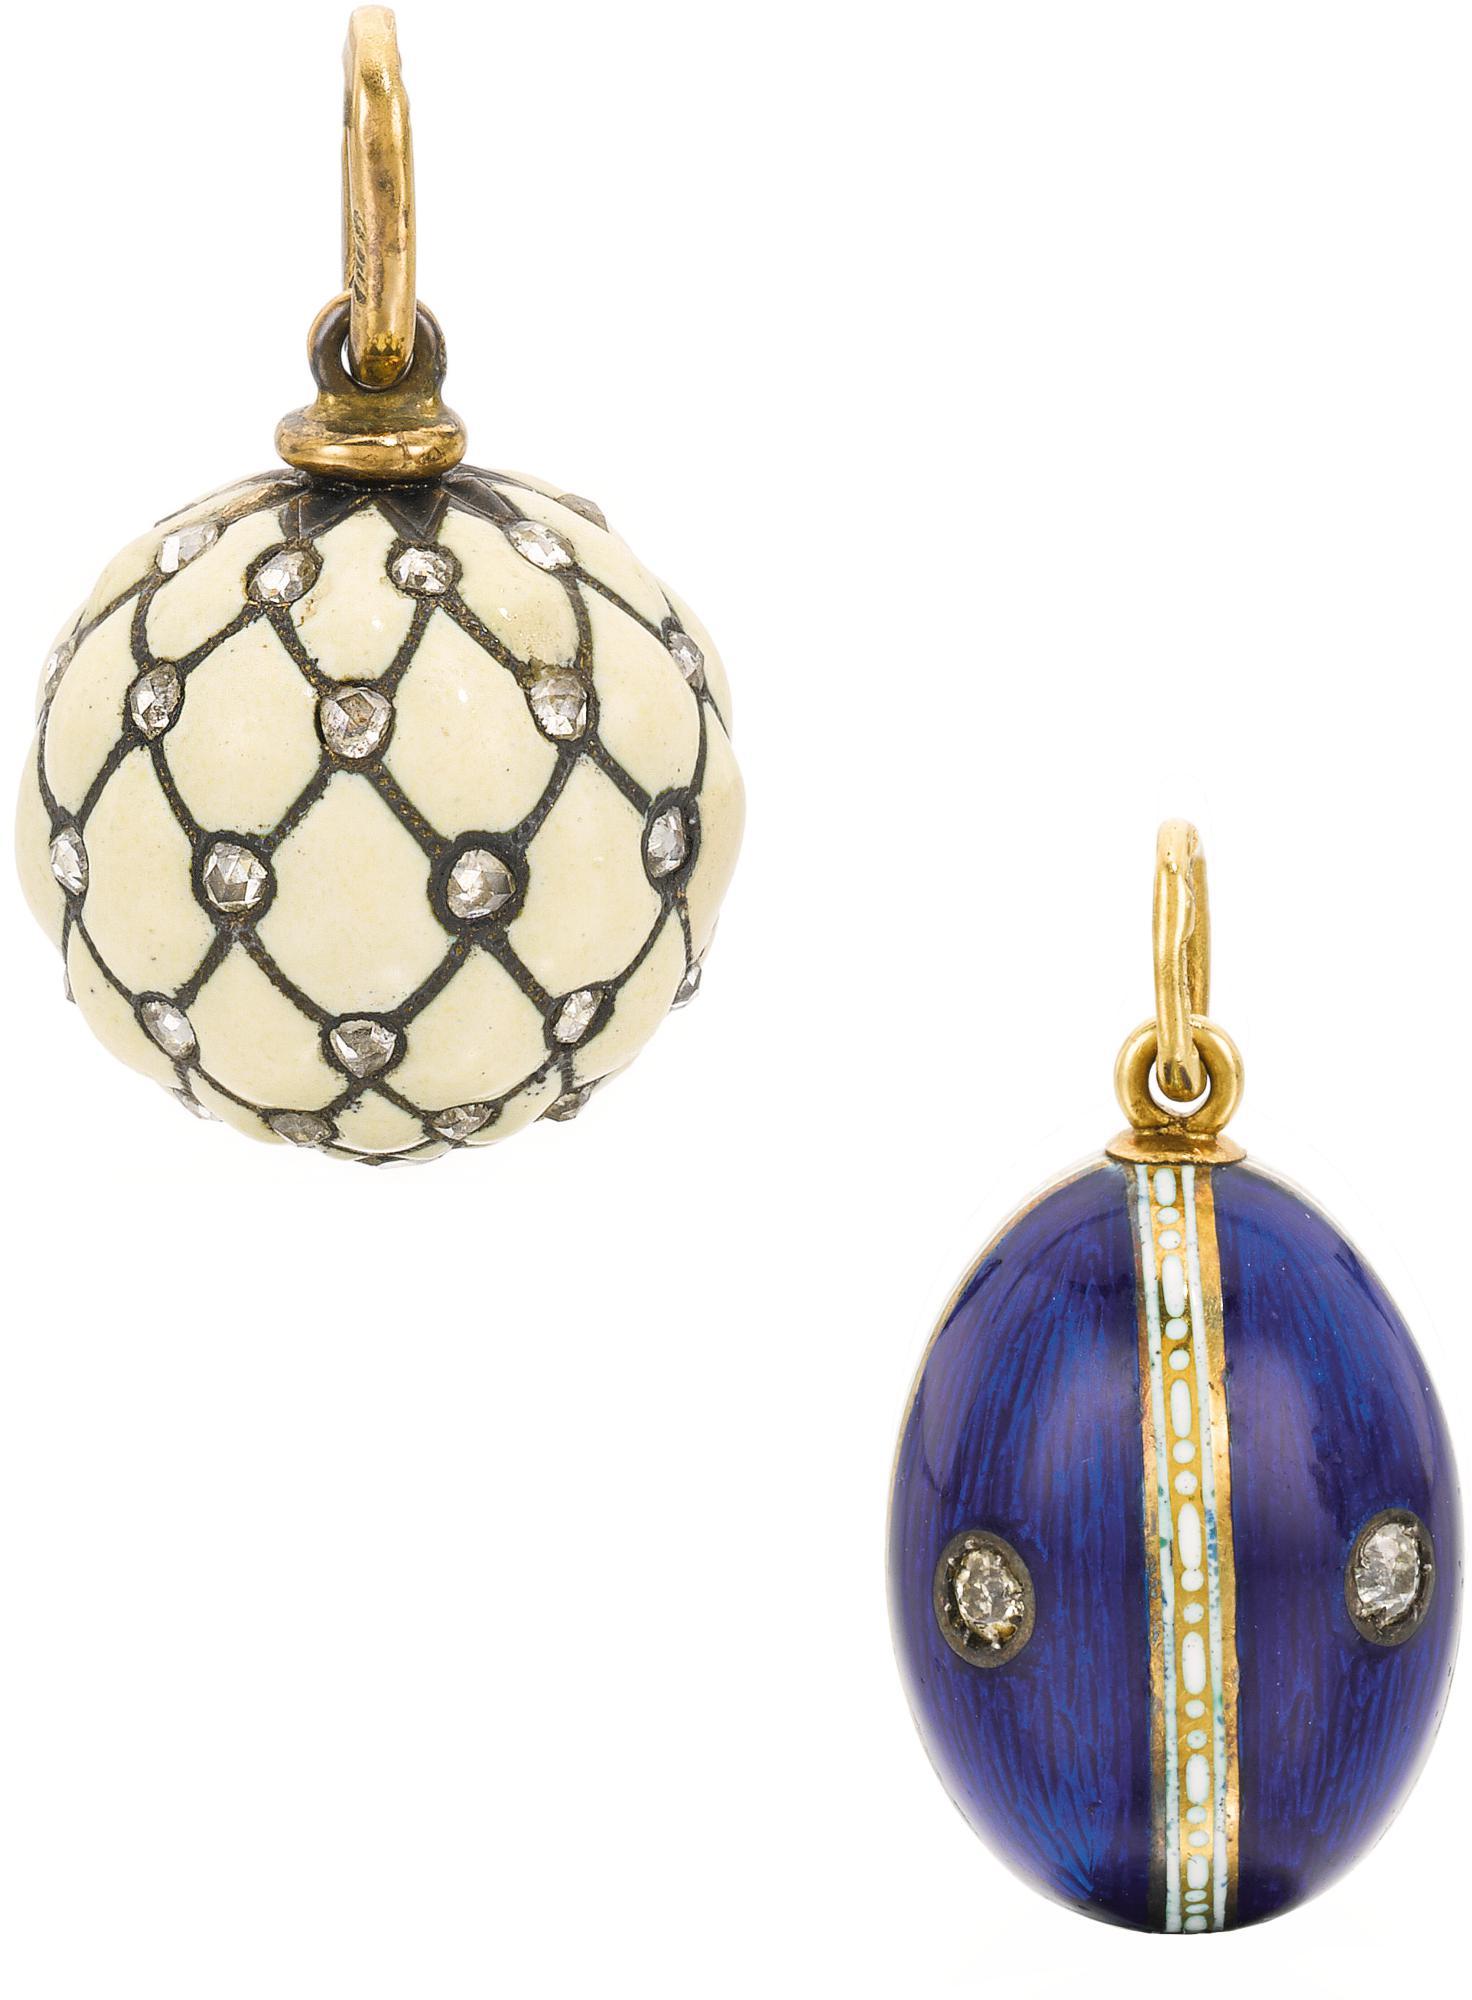 1917 Constellation Royal Glass Egg Ornament